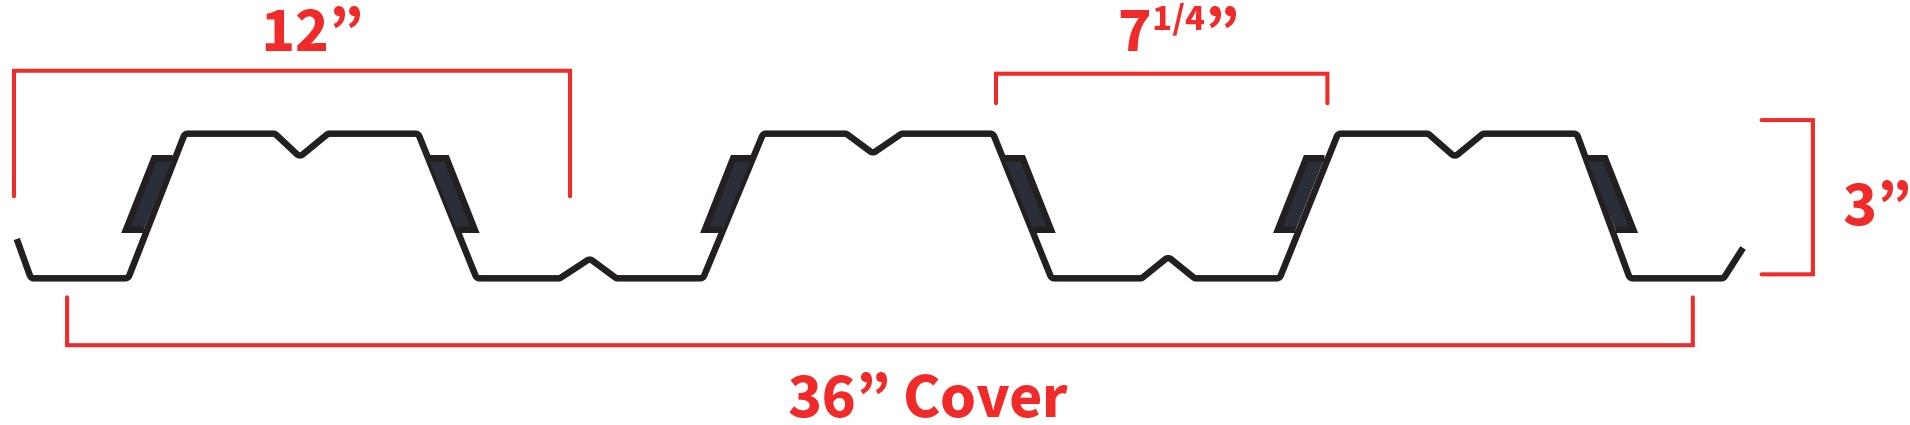 3.0 or 3VLI Composite Deck Profile